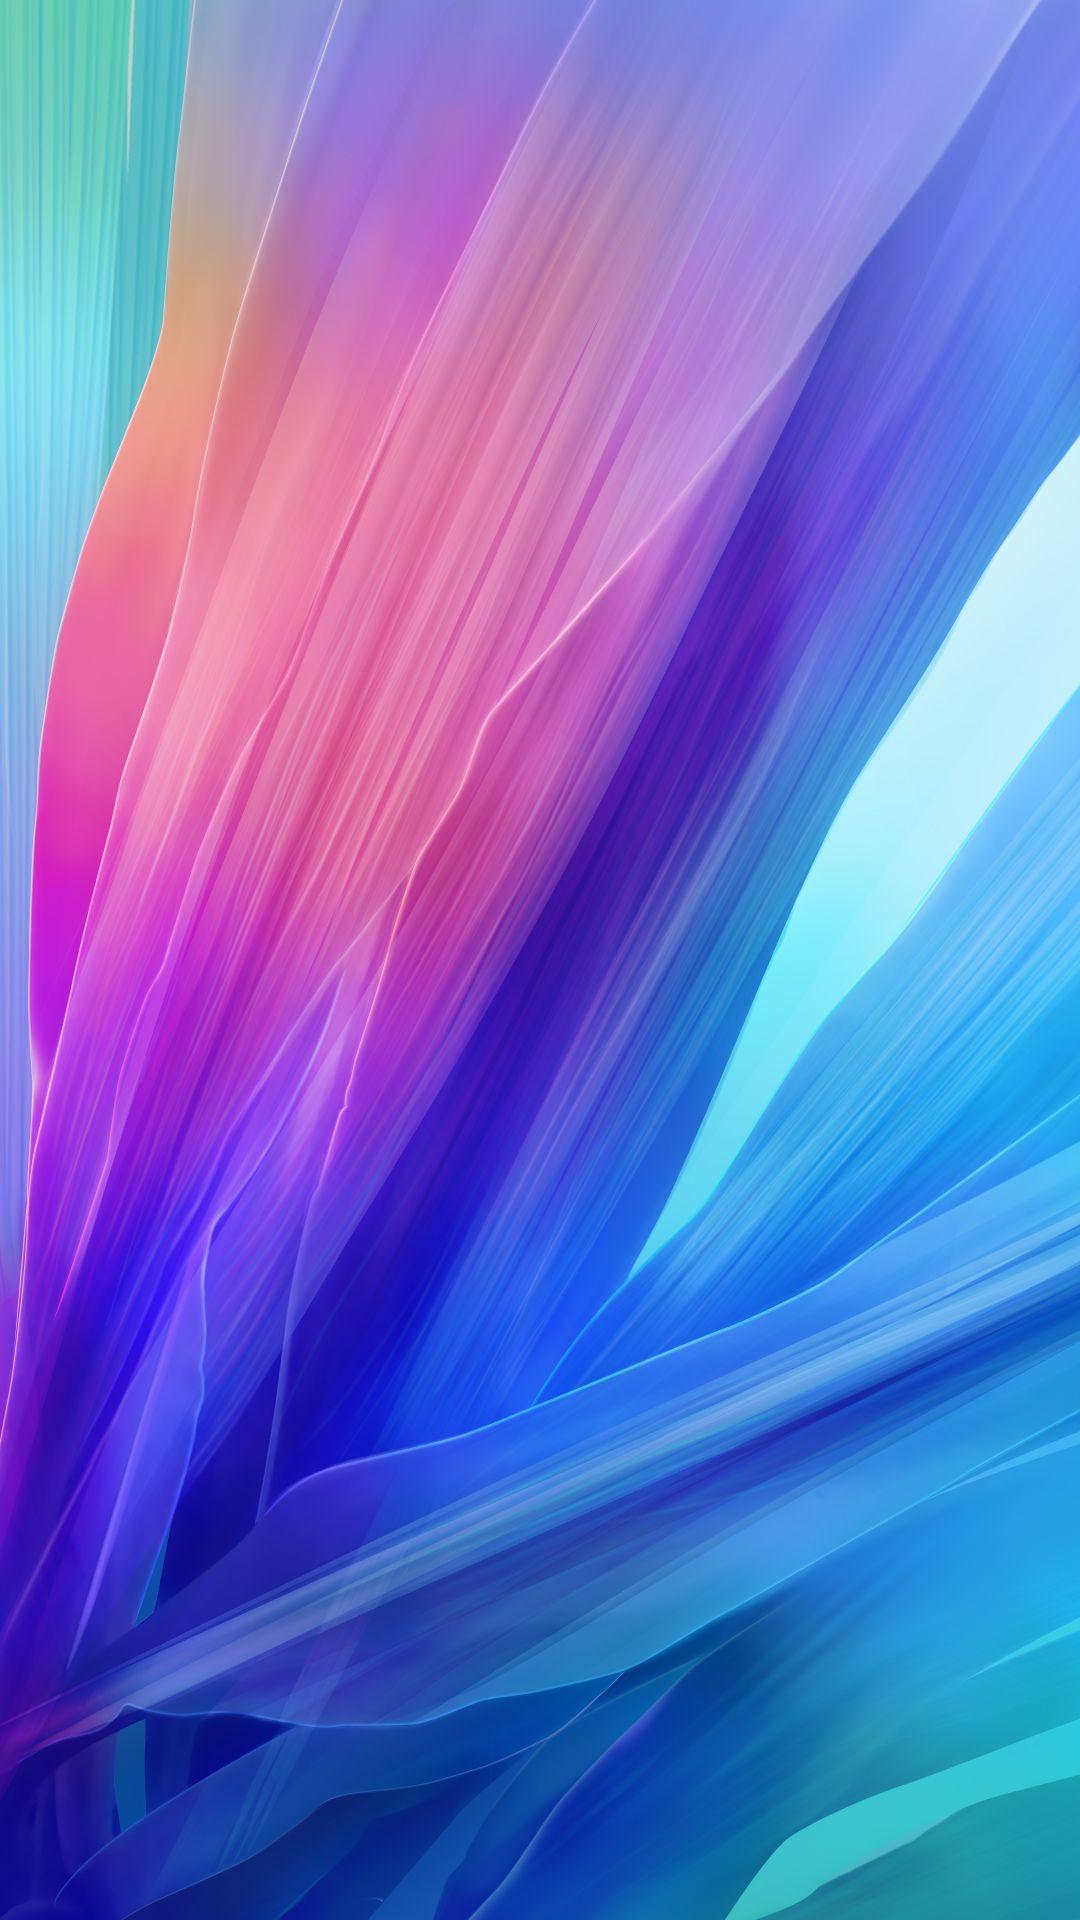 Wallpaper Iphone 7 Makemac - Apple 7 Plus Wallpaper Hd , HD Wallpaper & Backgrounds